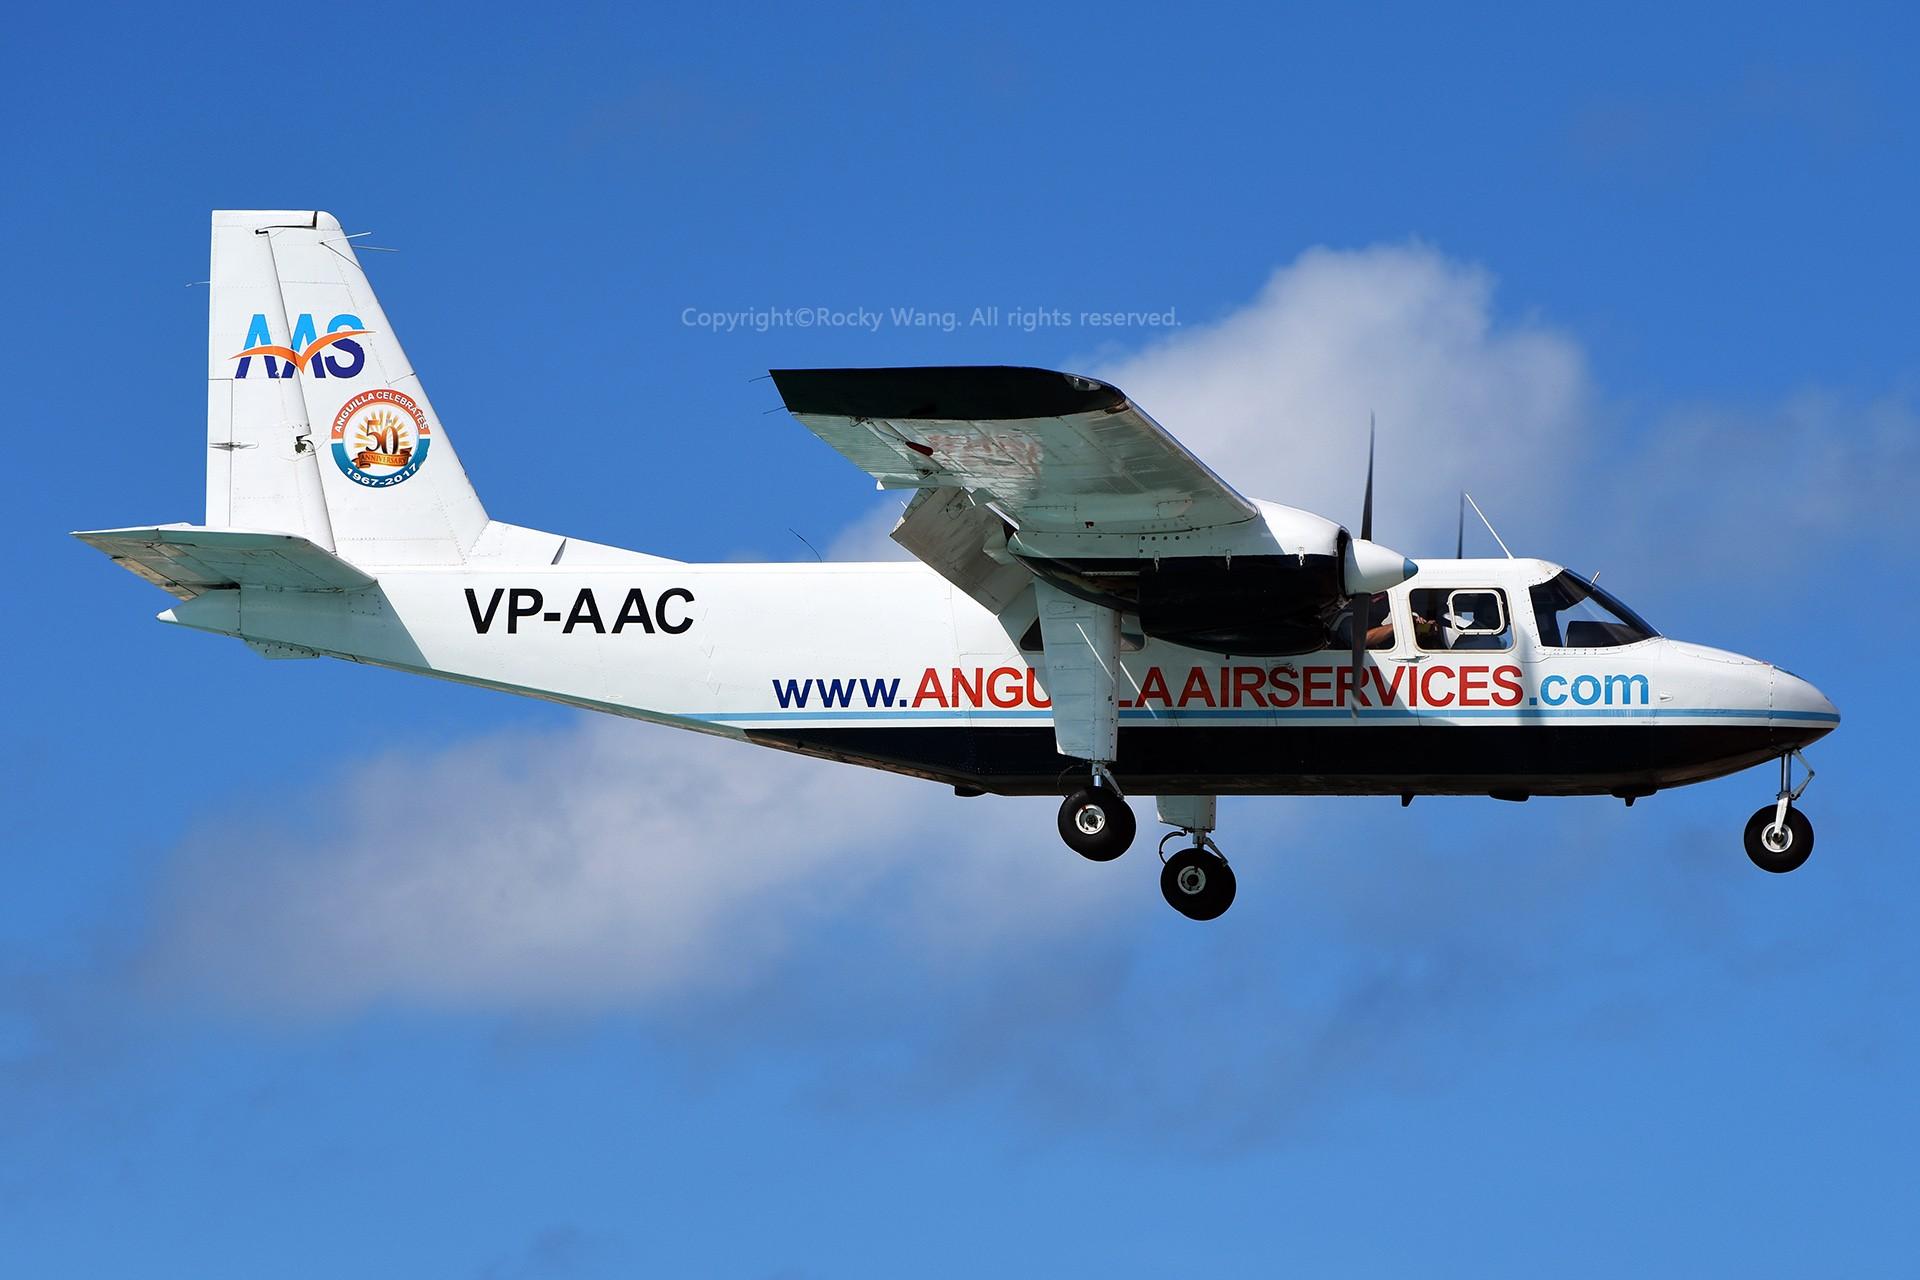 Re:[原创]My endless Caribbean dream——圣马丁朱莉安娜公主机场拍机记 BRITTEN-NORMAN BN-2A ISLANDER VP-AAC 荷属安的列斯群岛朱利安娜公主机场